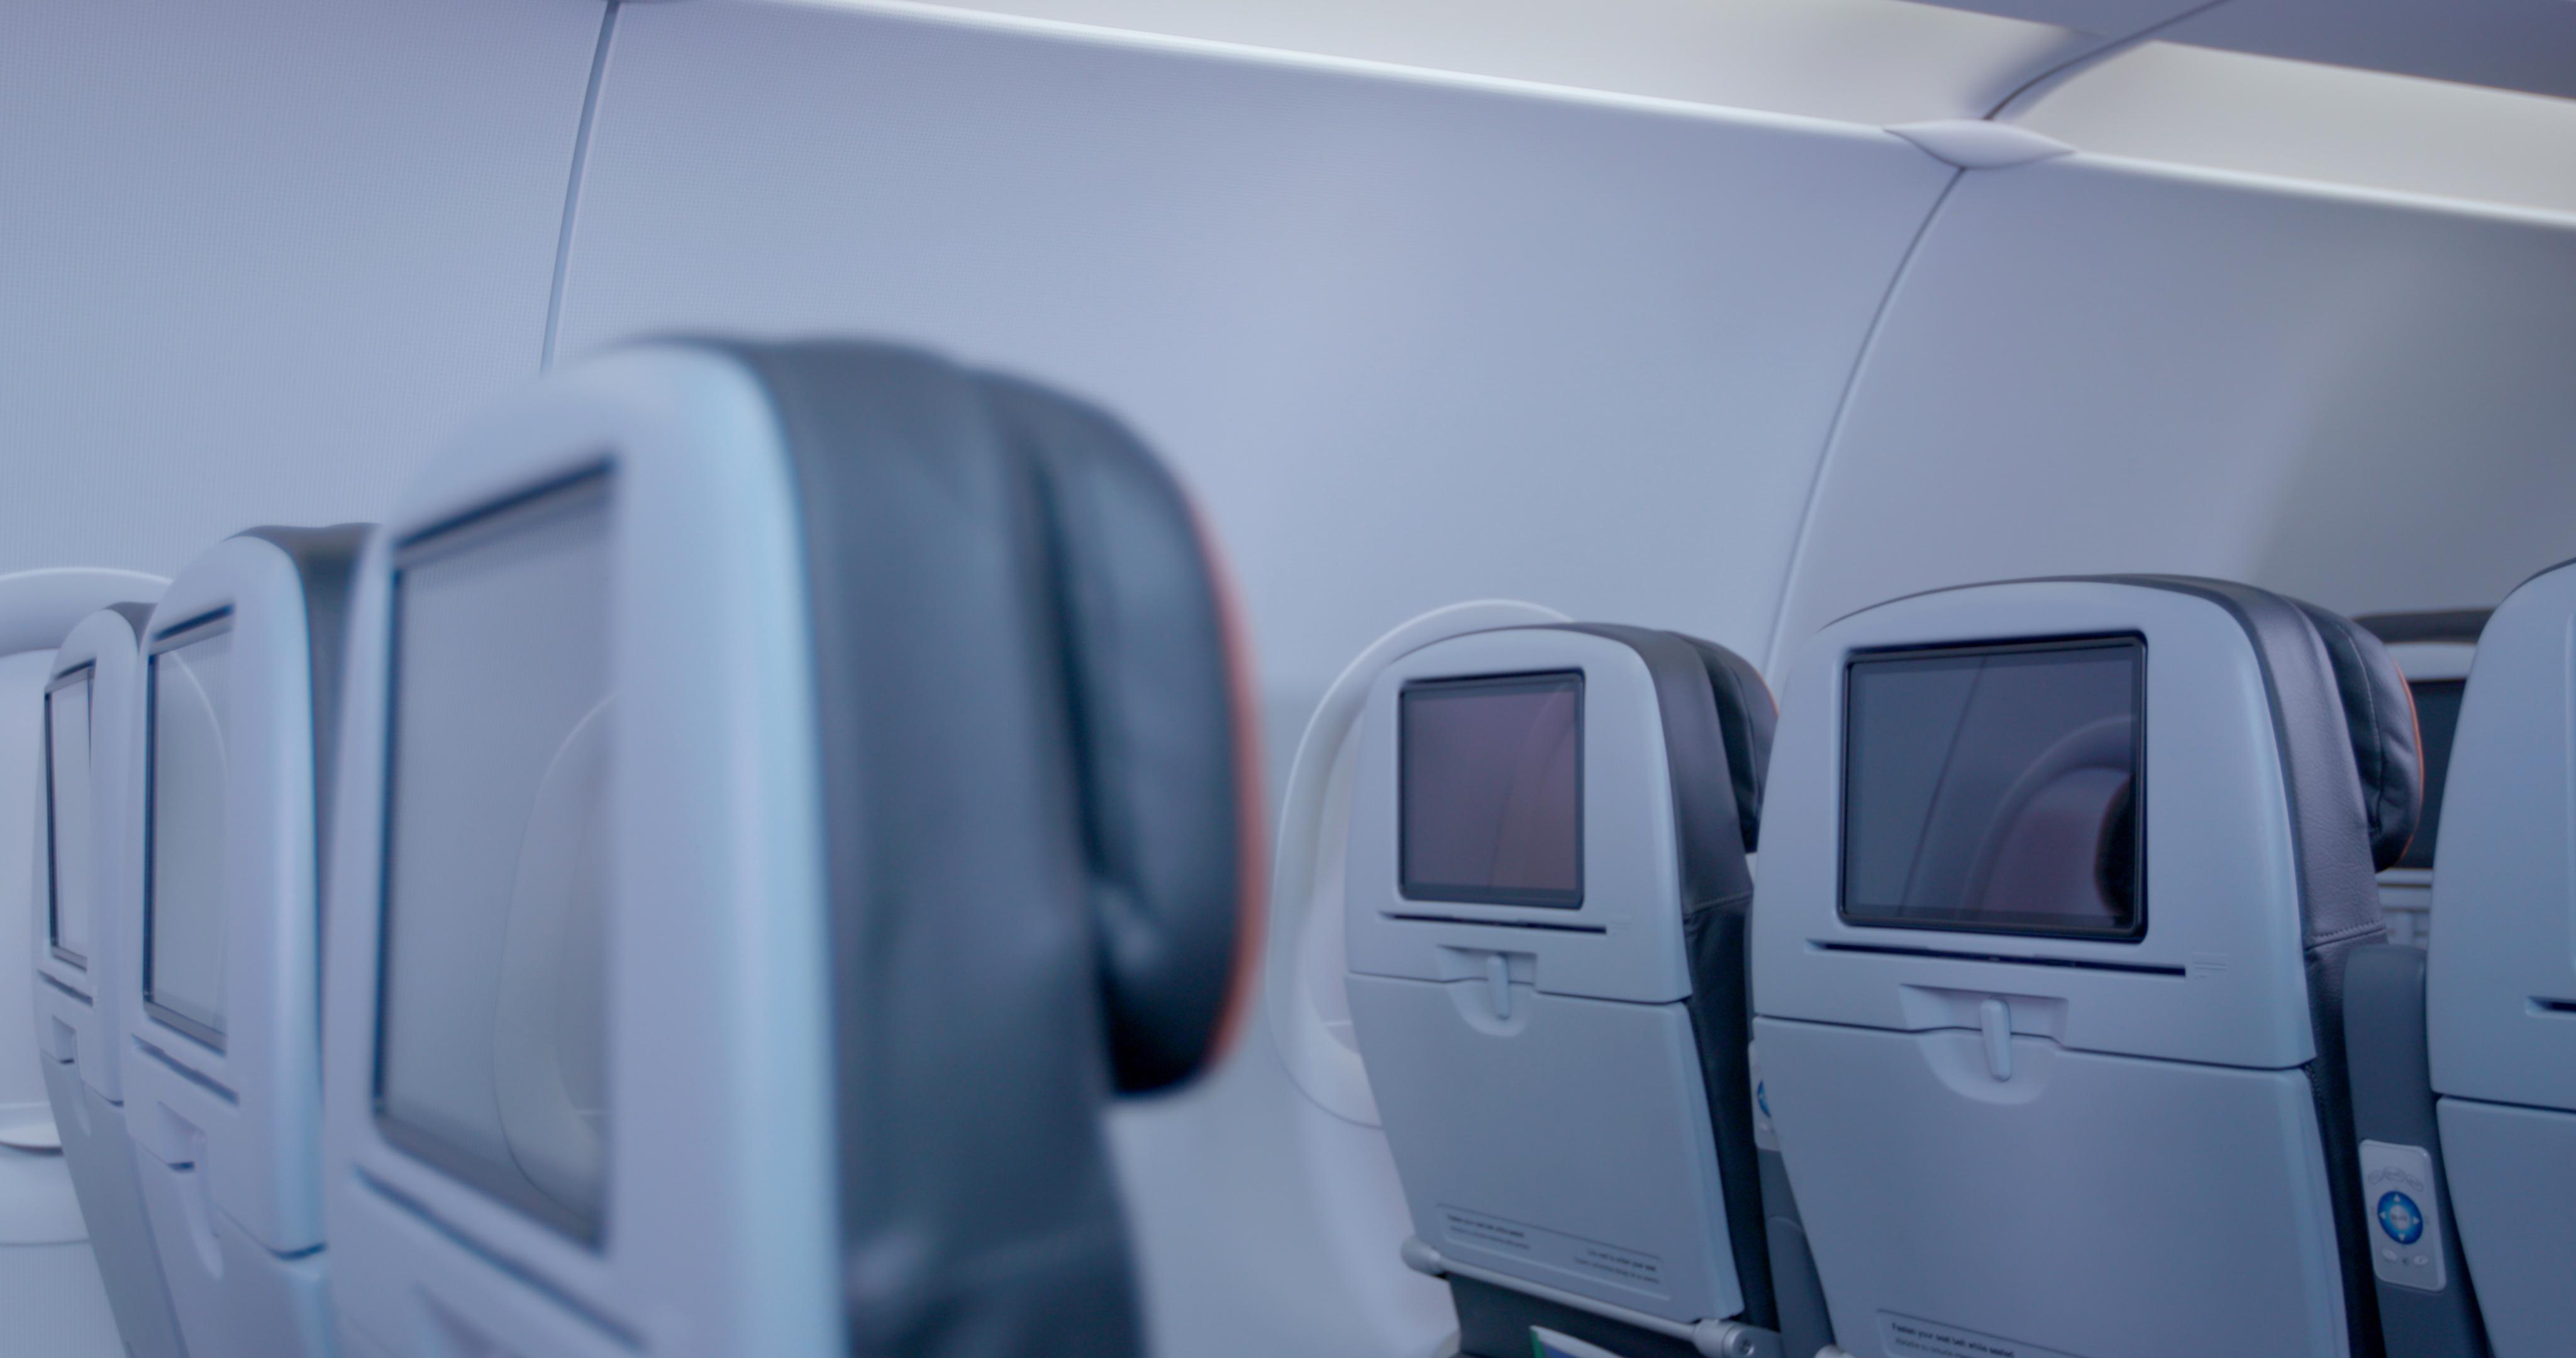 JetBlue New Interior (Photo: Business Wire)